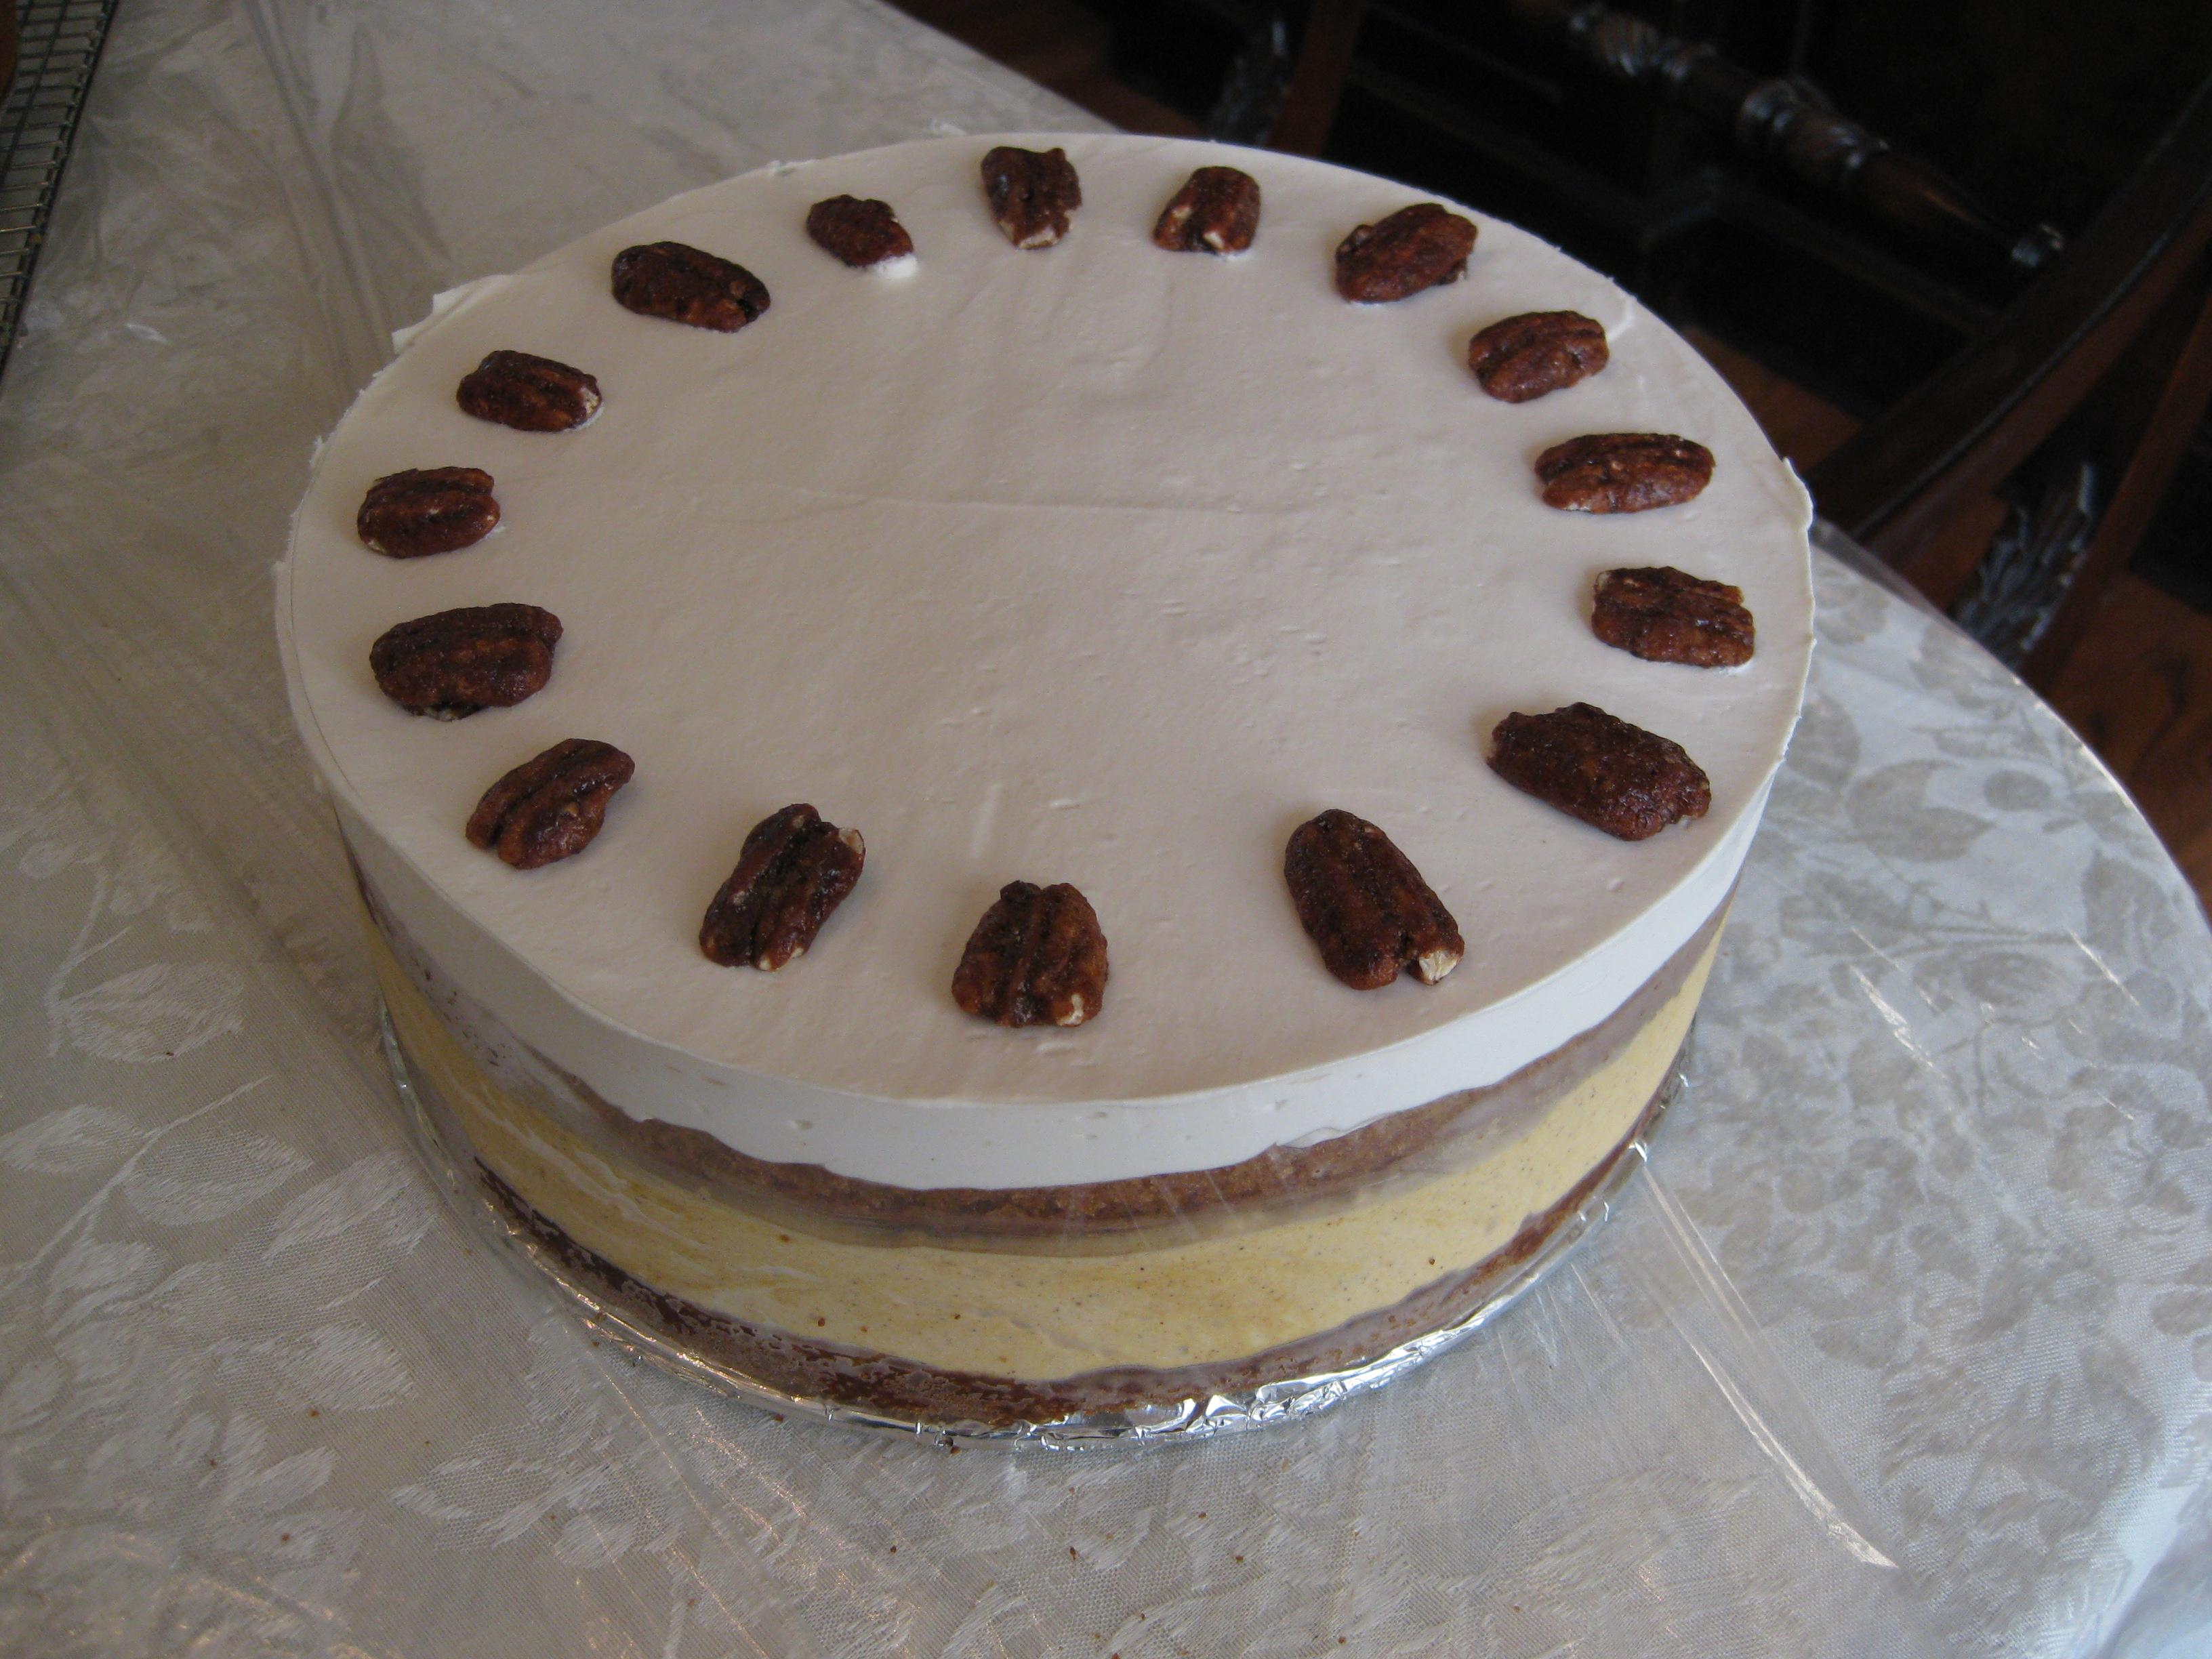 ... Desserts: Apple Breton and Pumpkin Mousse Cake | Pragmatic Attic